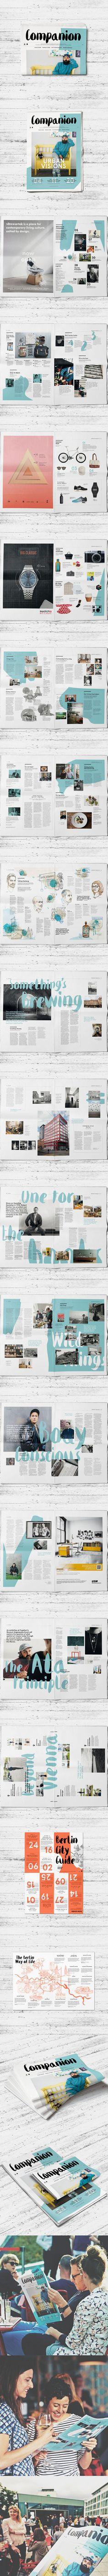 Companion Magazine #02 by Stefan Schuster, via Behance